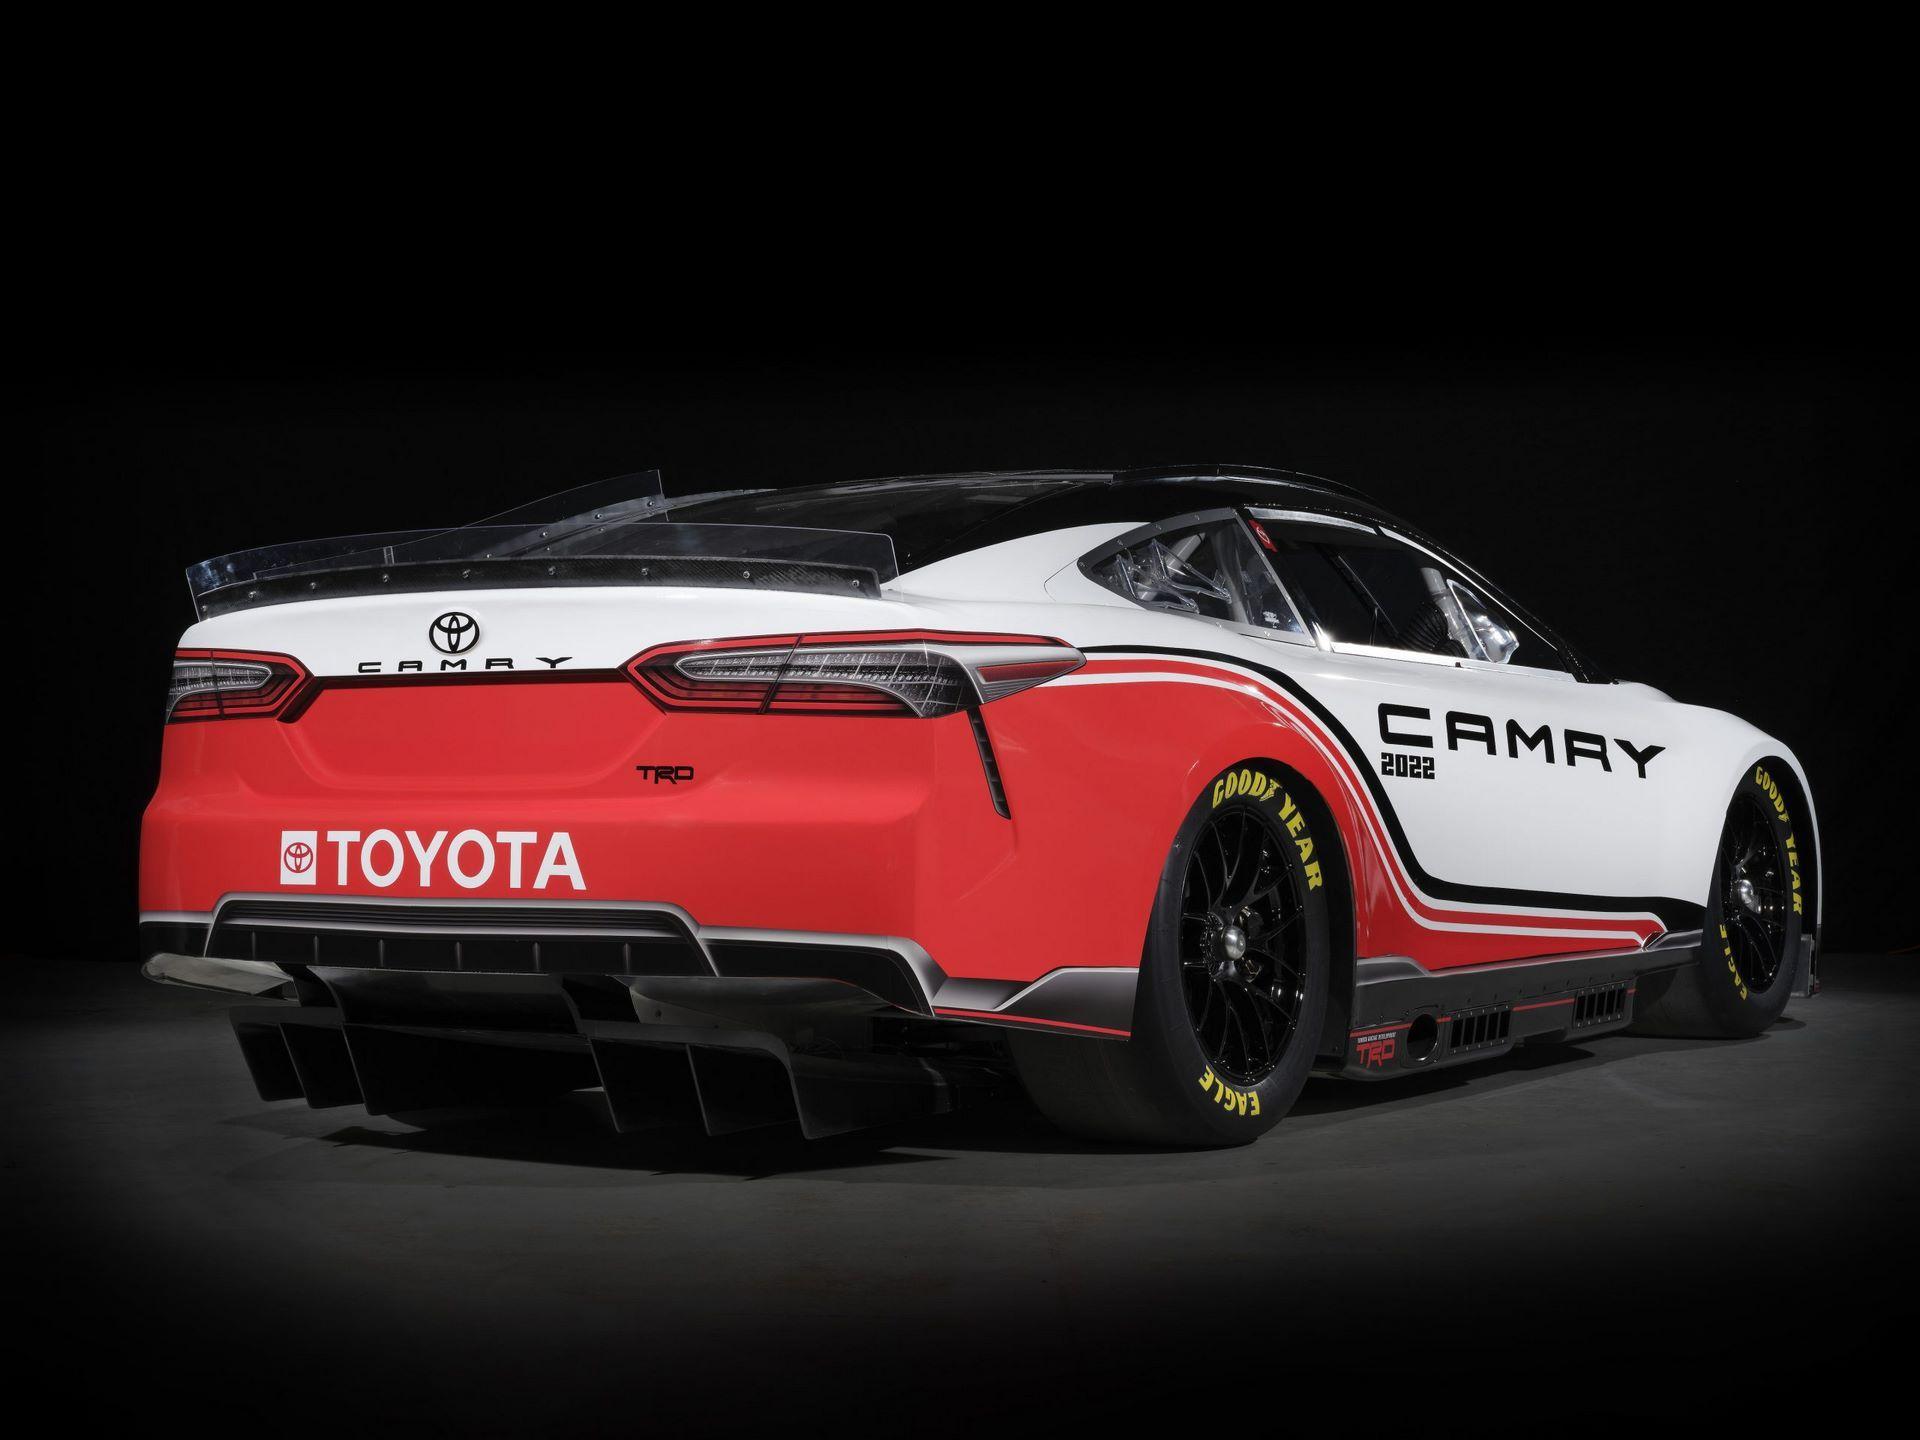 Toyota-TRD-Camry-Next-Gen-Nascar-7